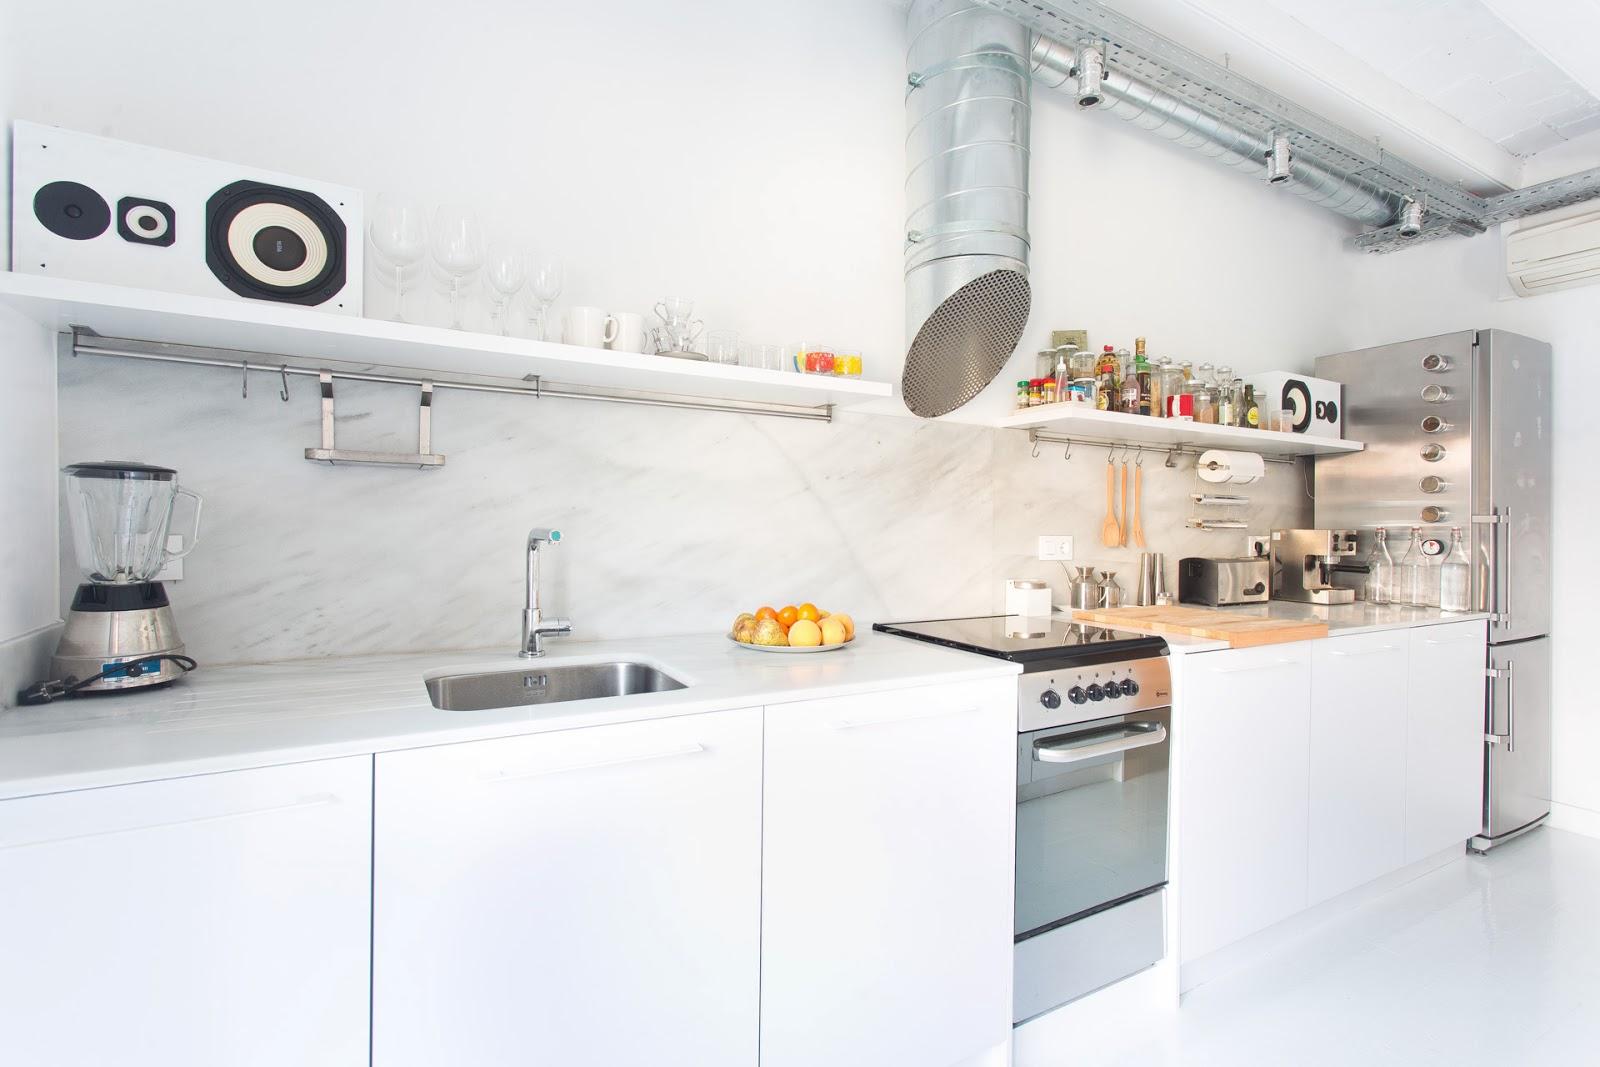 Productos contract rehabilitacion piso en barcelona for Idee deco cuisine avec lit rond